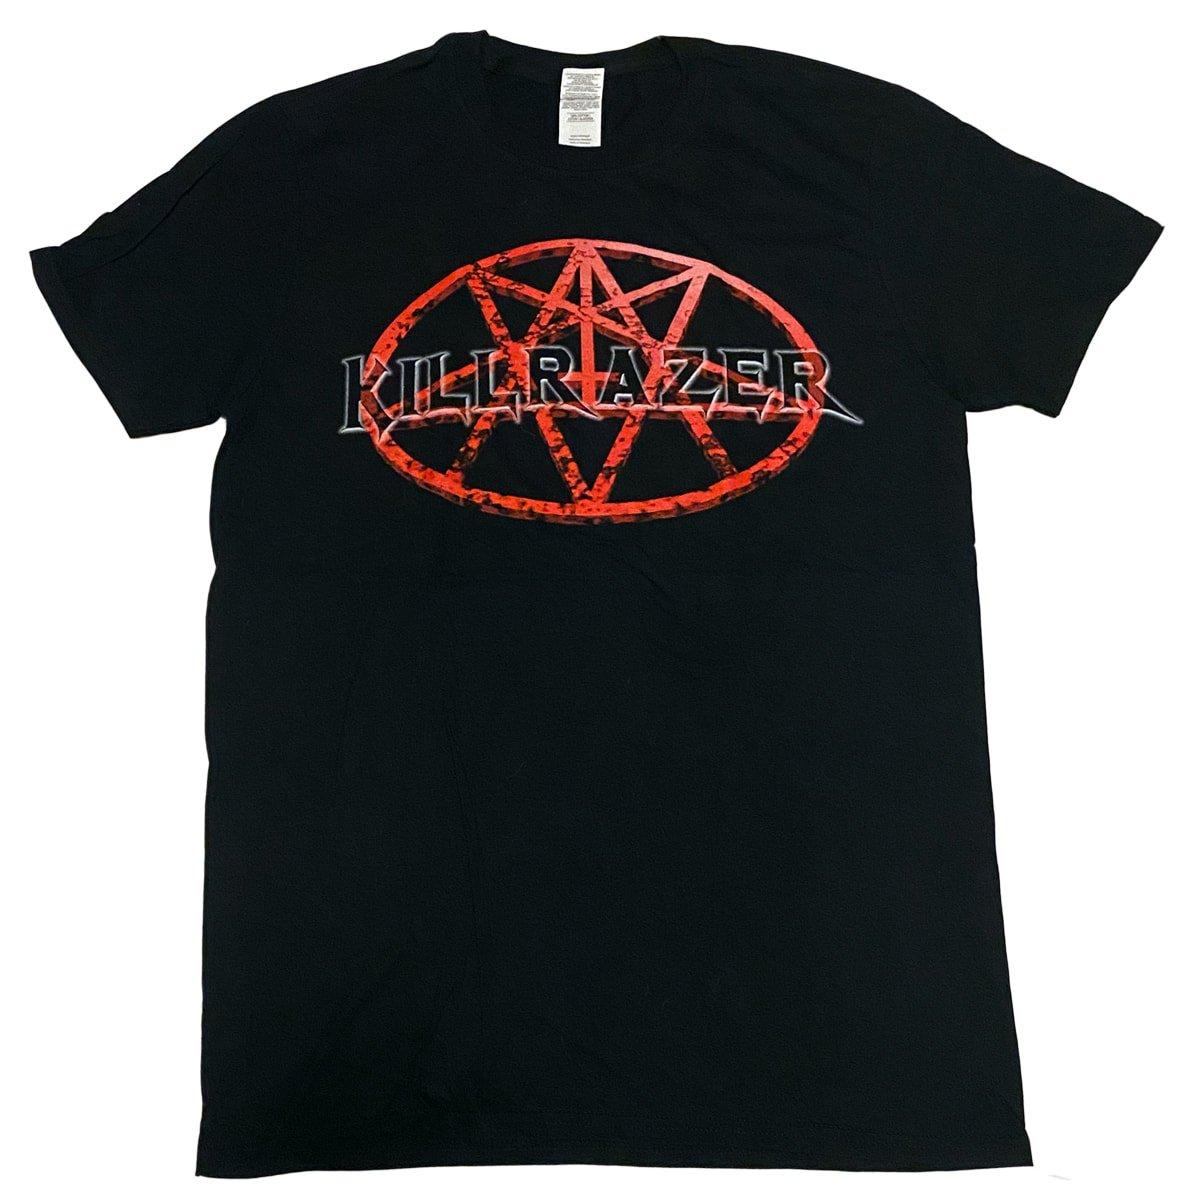 Image of KILLRAZER - Pentagram front / Song Titles back - Shirt